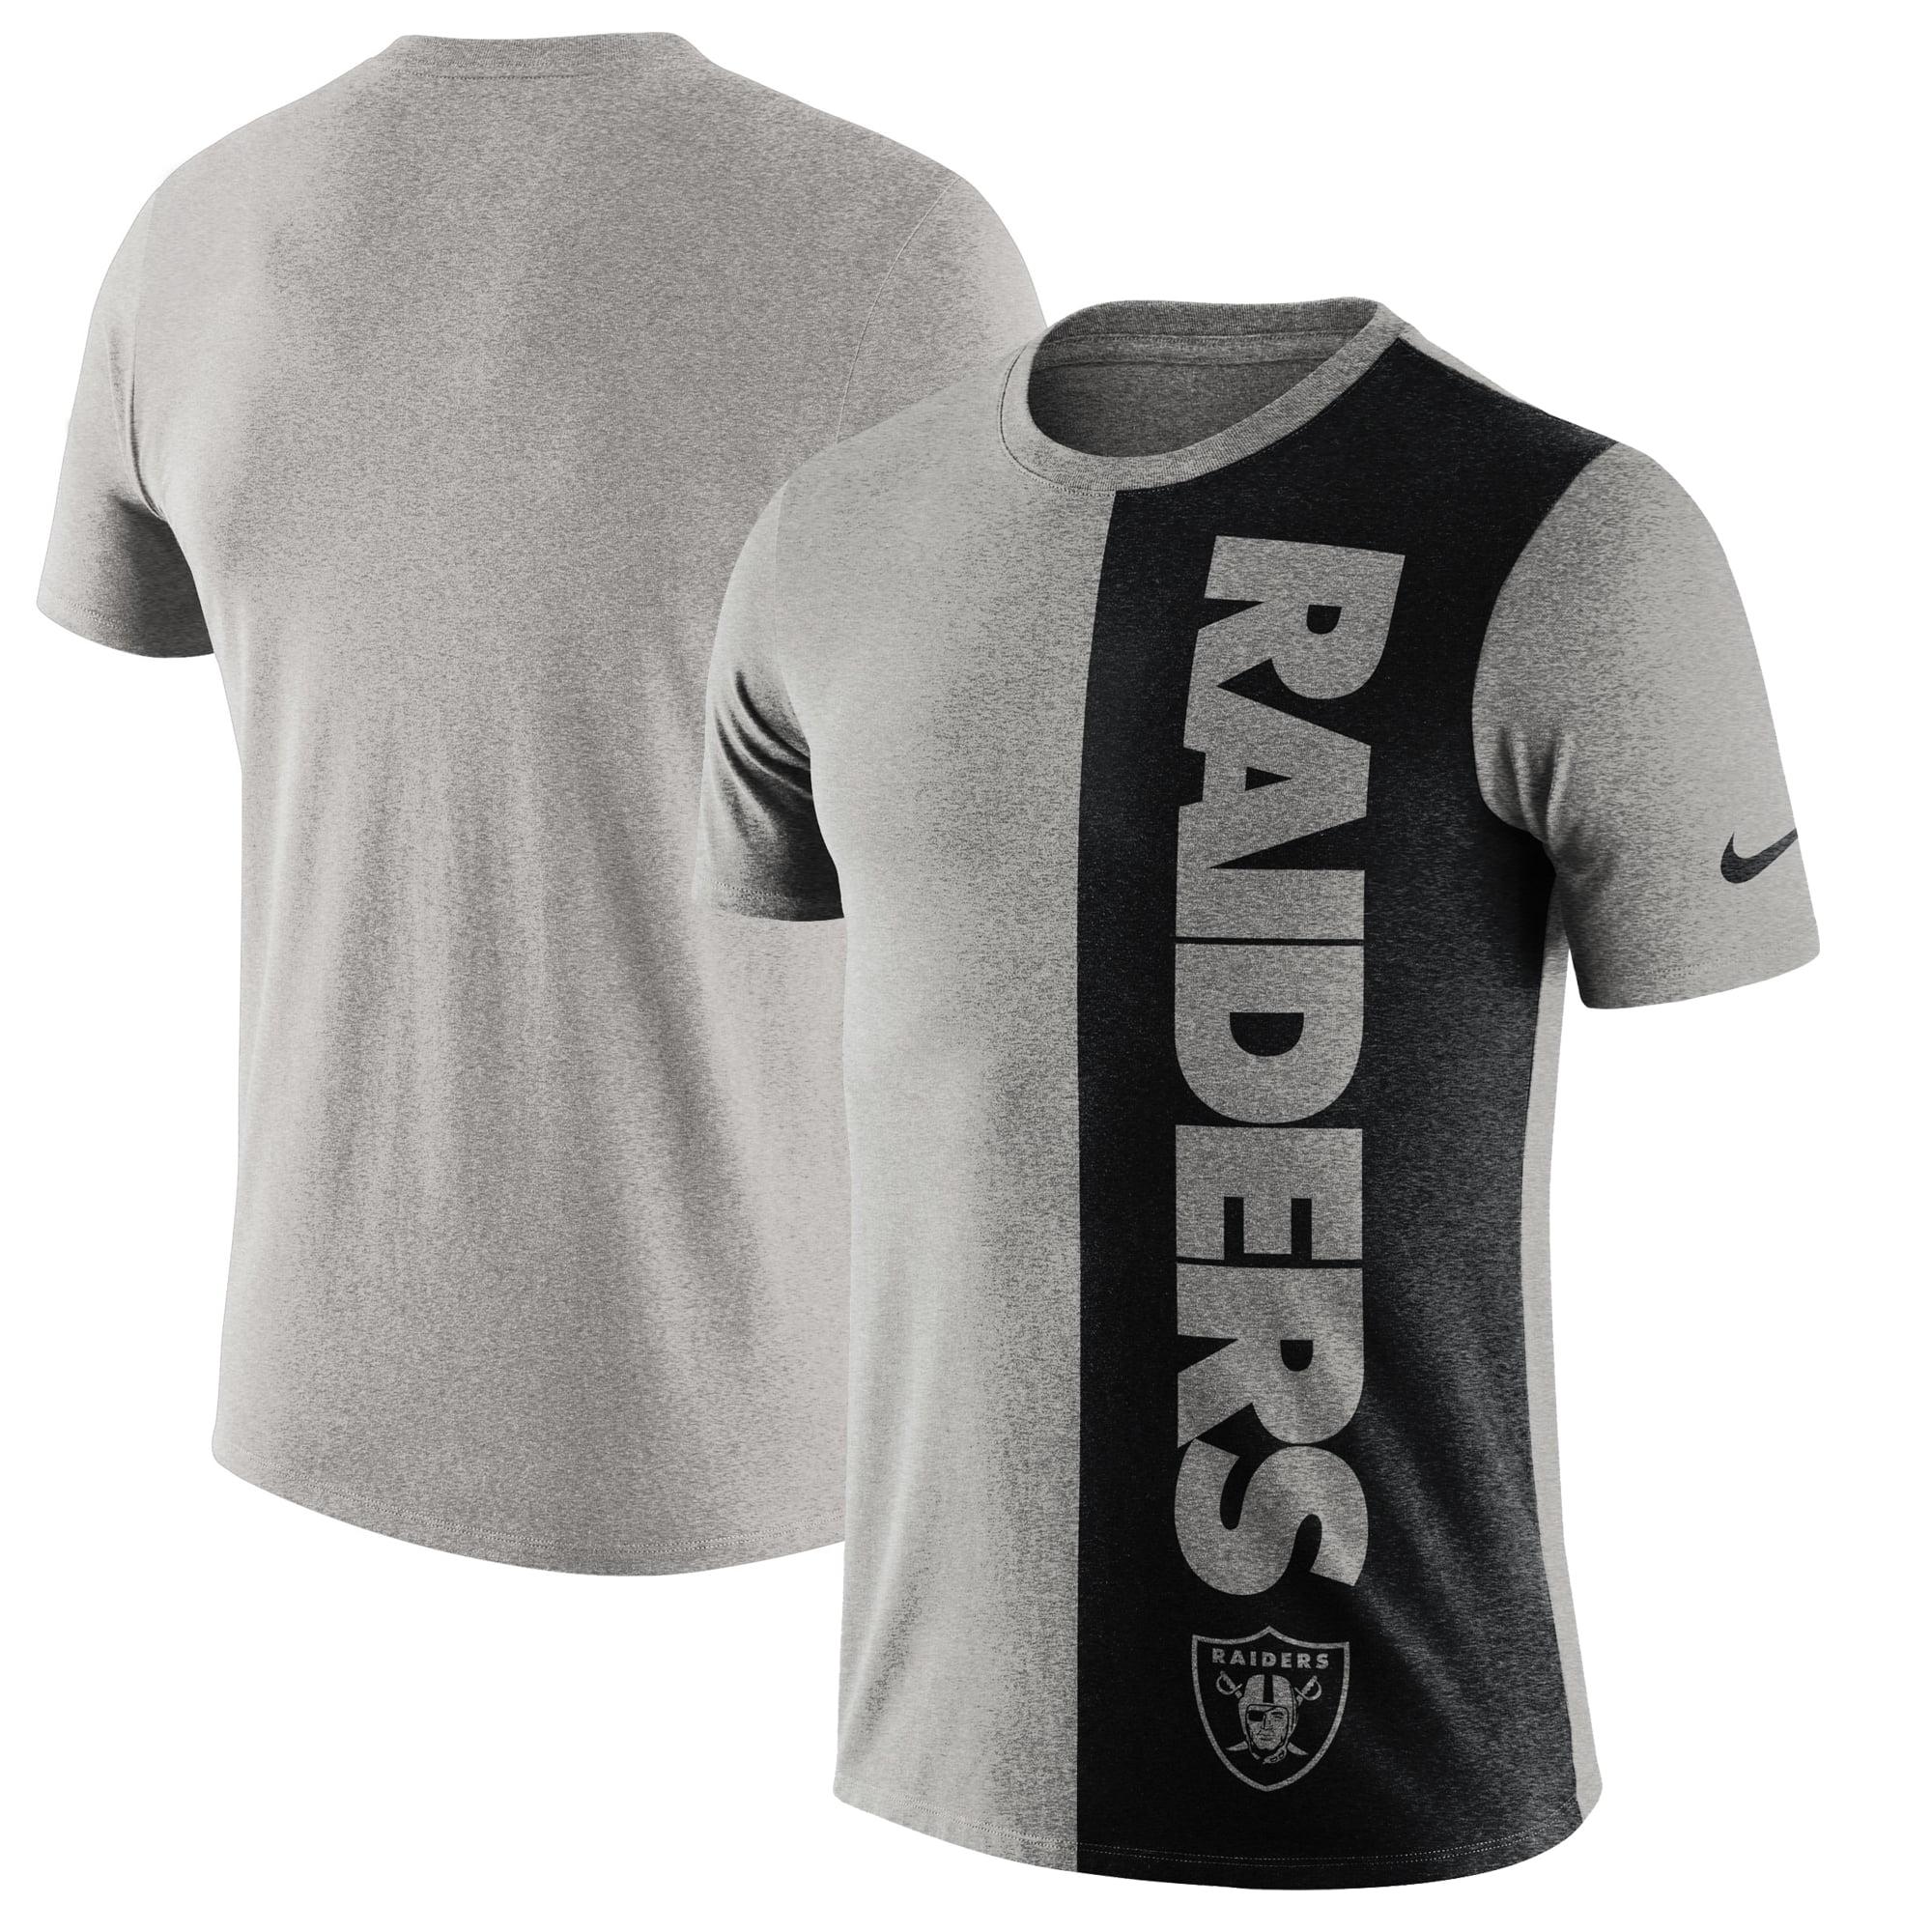 Oakland Raiders Nike Coin Flip Tri-Blend T-Shirt - Heathered Gray/Black